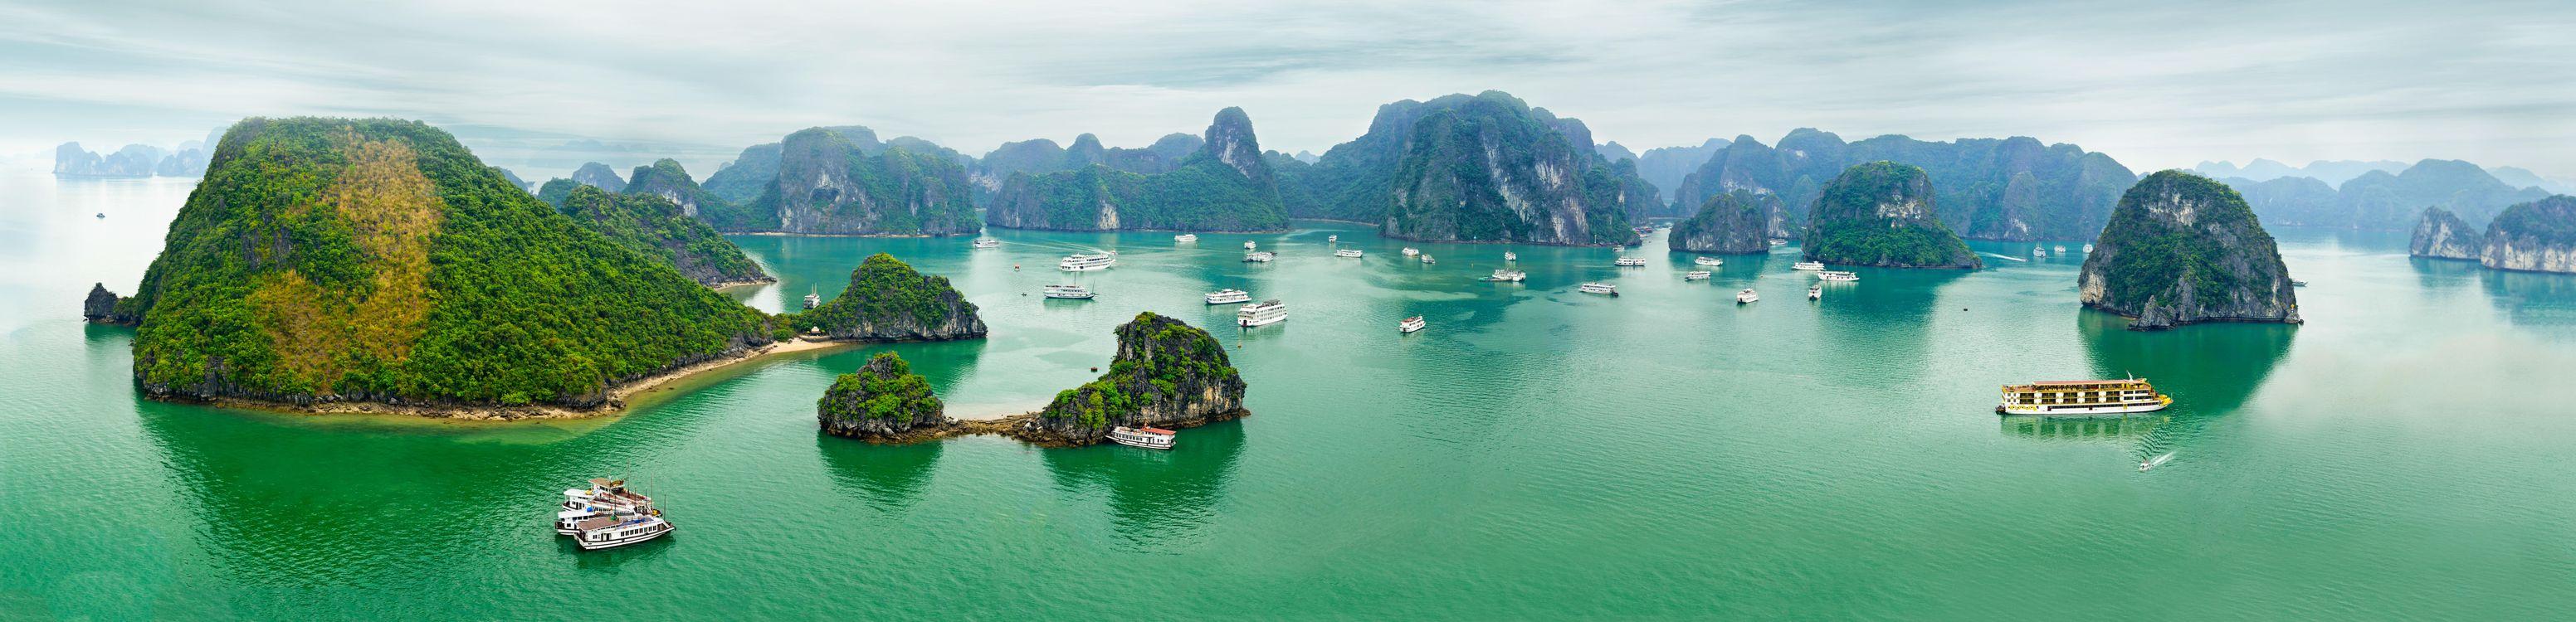 Обои Halong Bay, Vietnam, море картинки на телефон